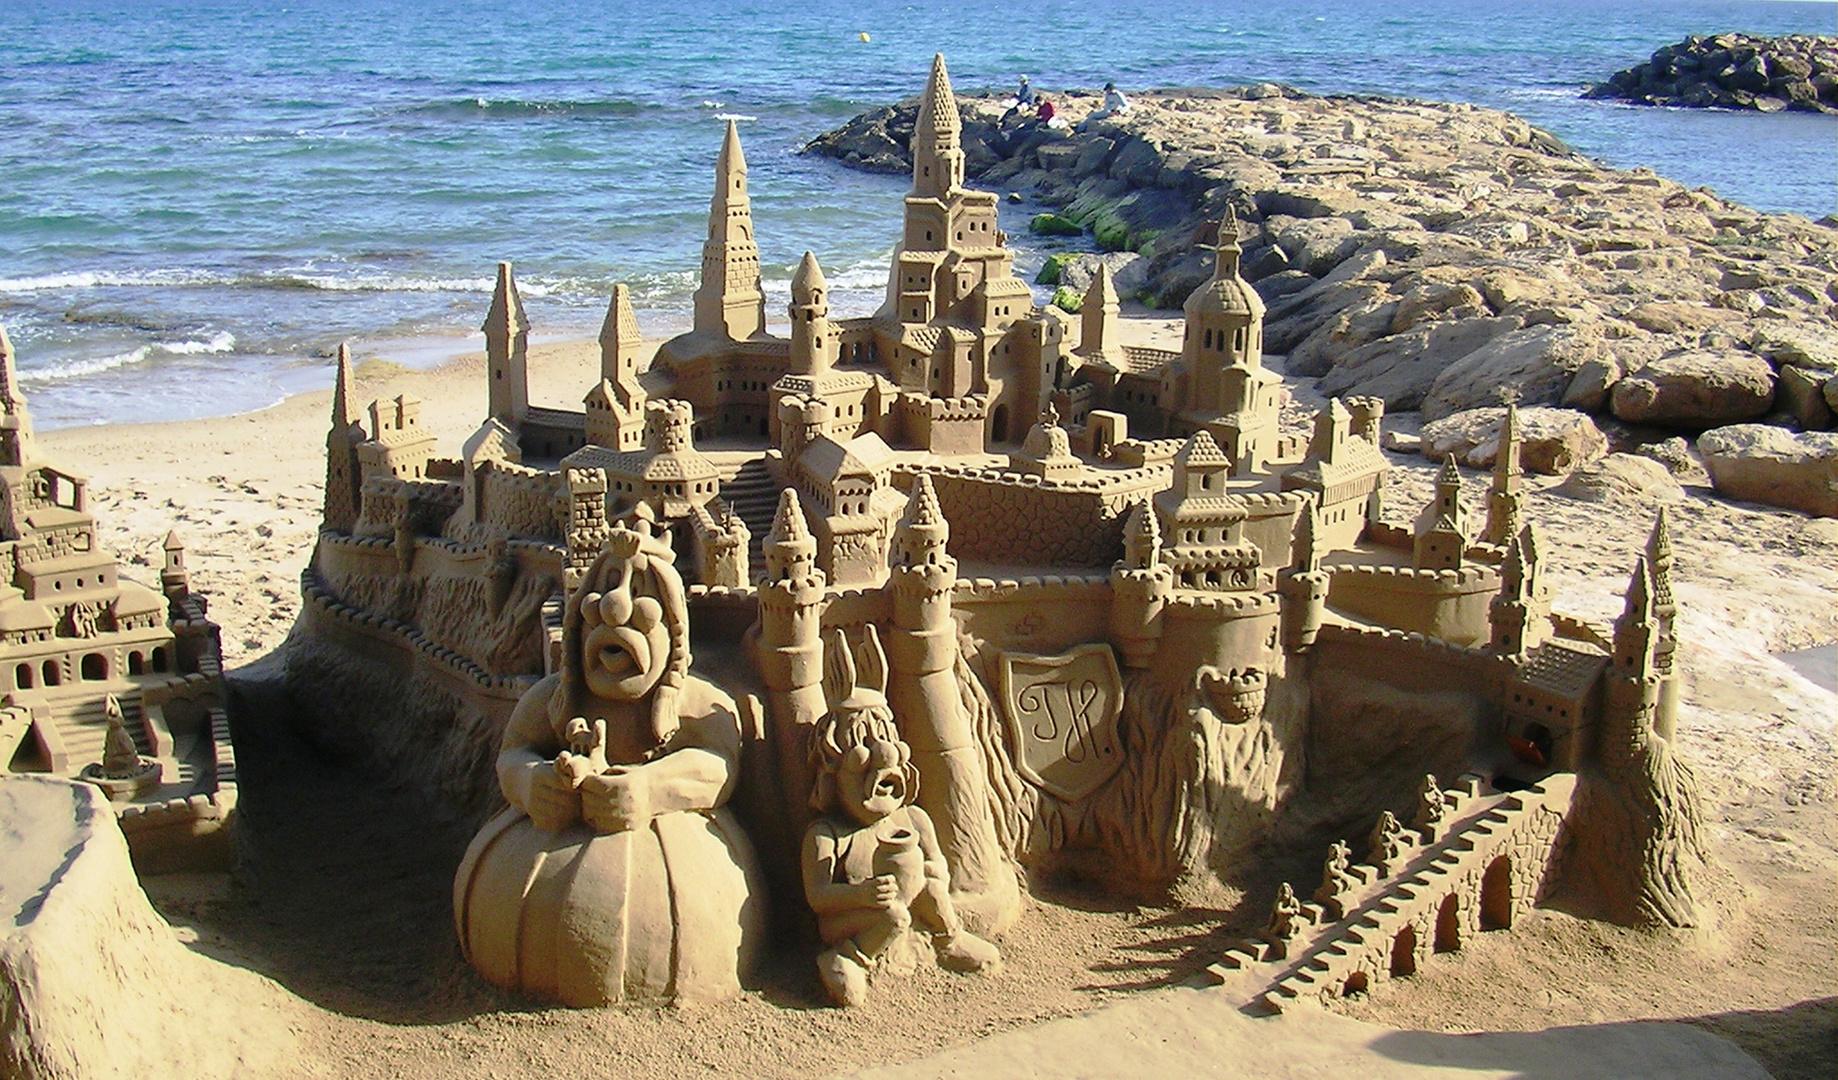 Asterix und Obelix am Strand...